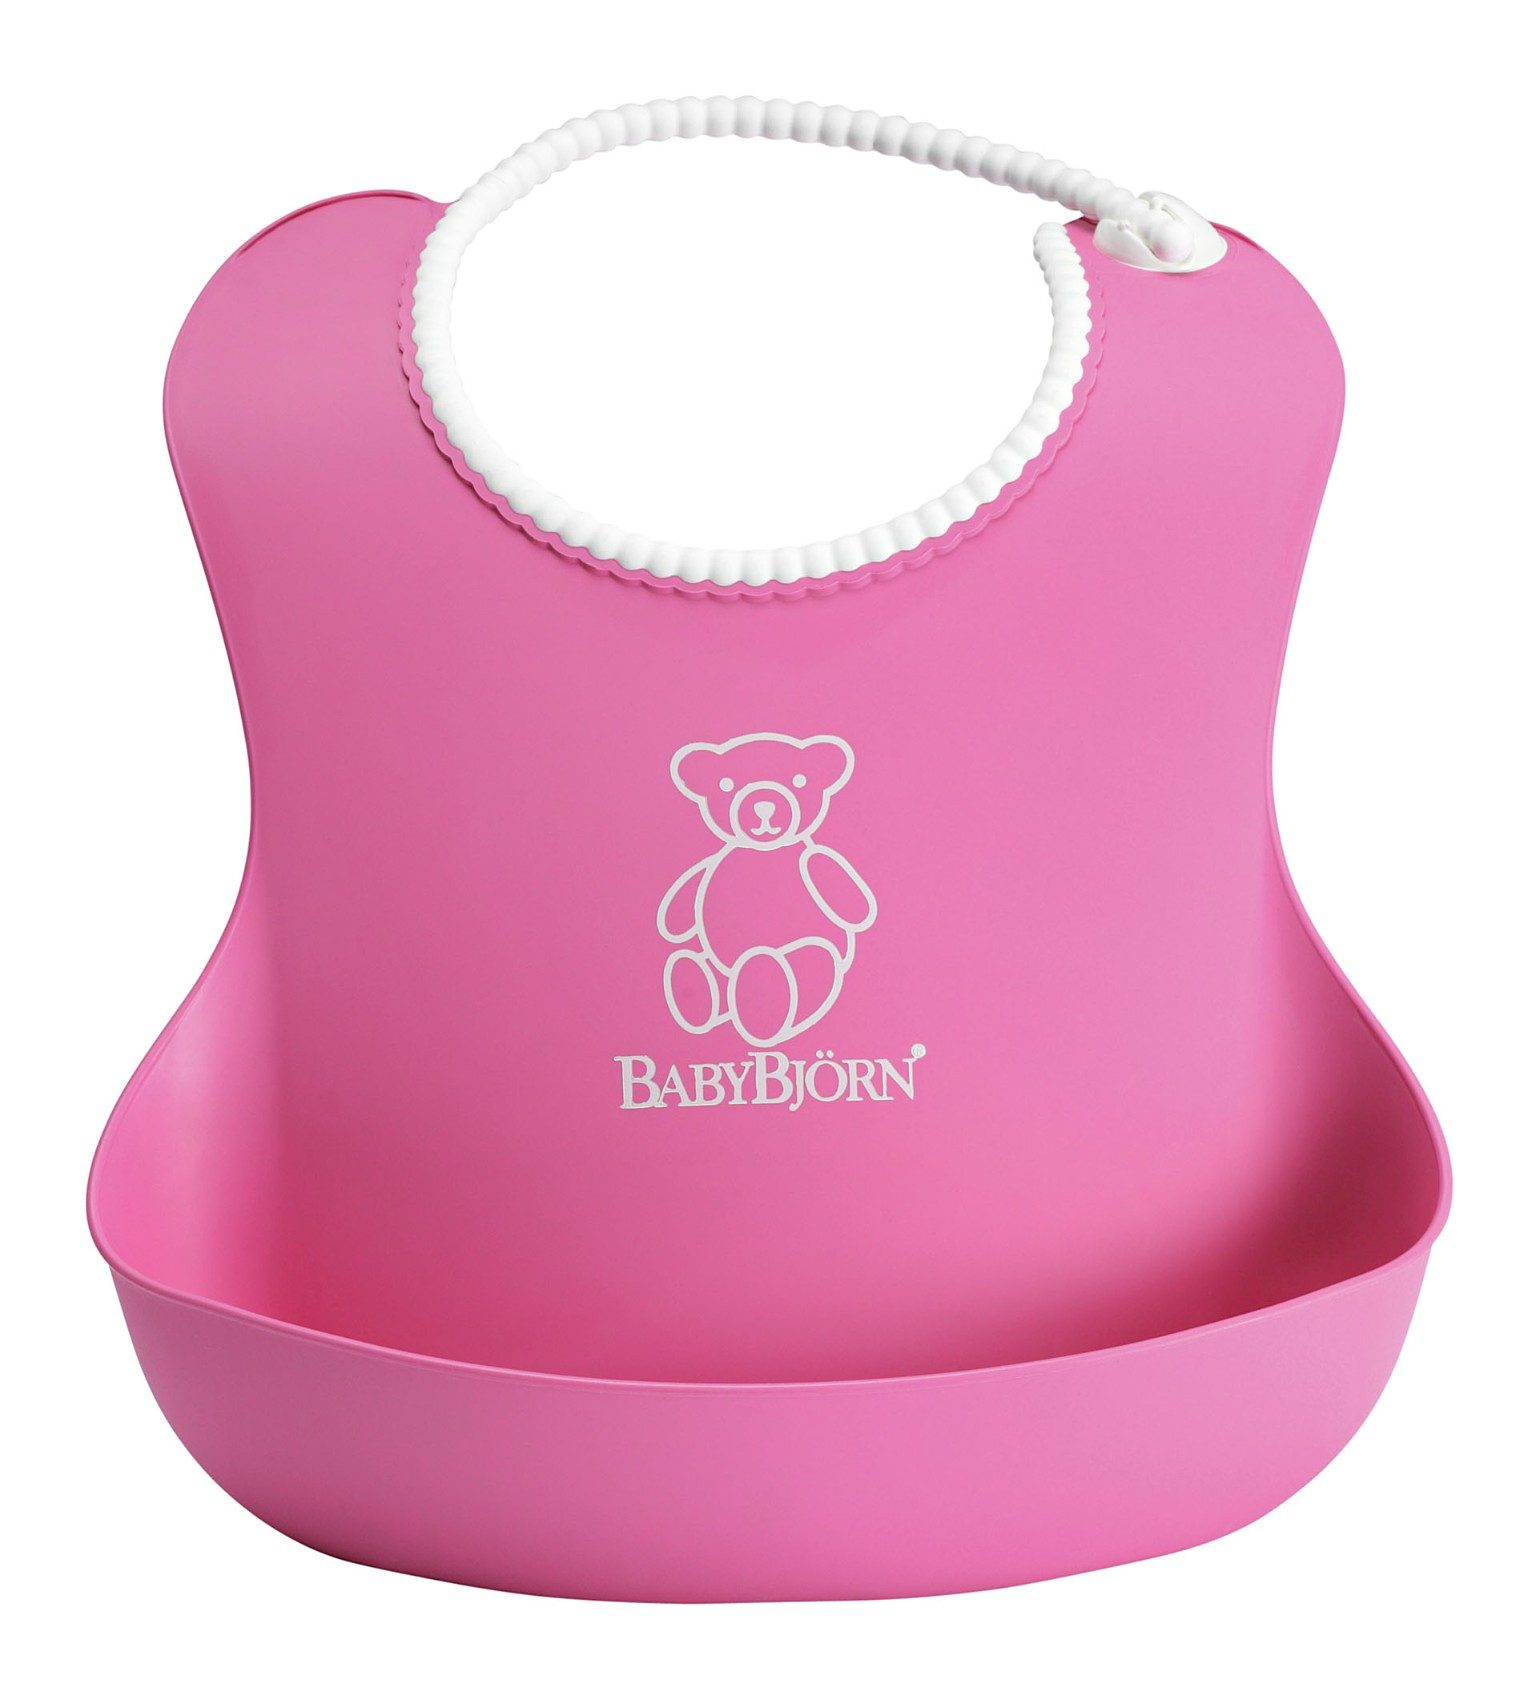 BabyBjörn Lätzchen mit Auffangschale, Pink